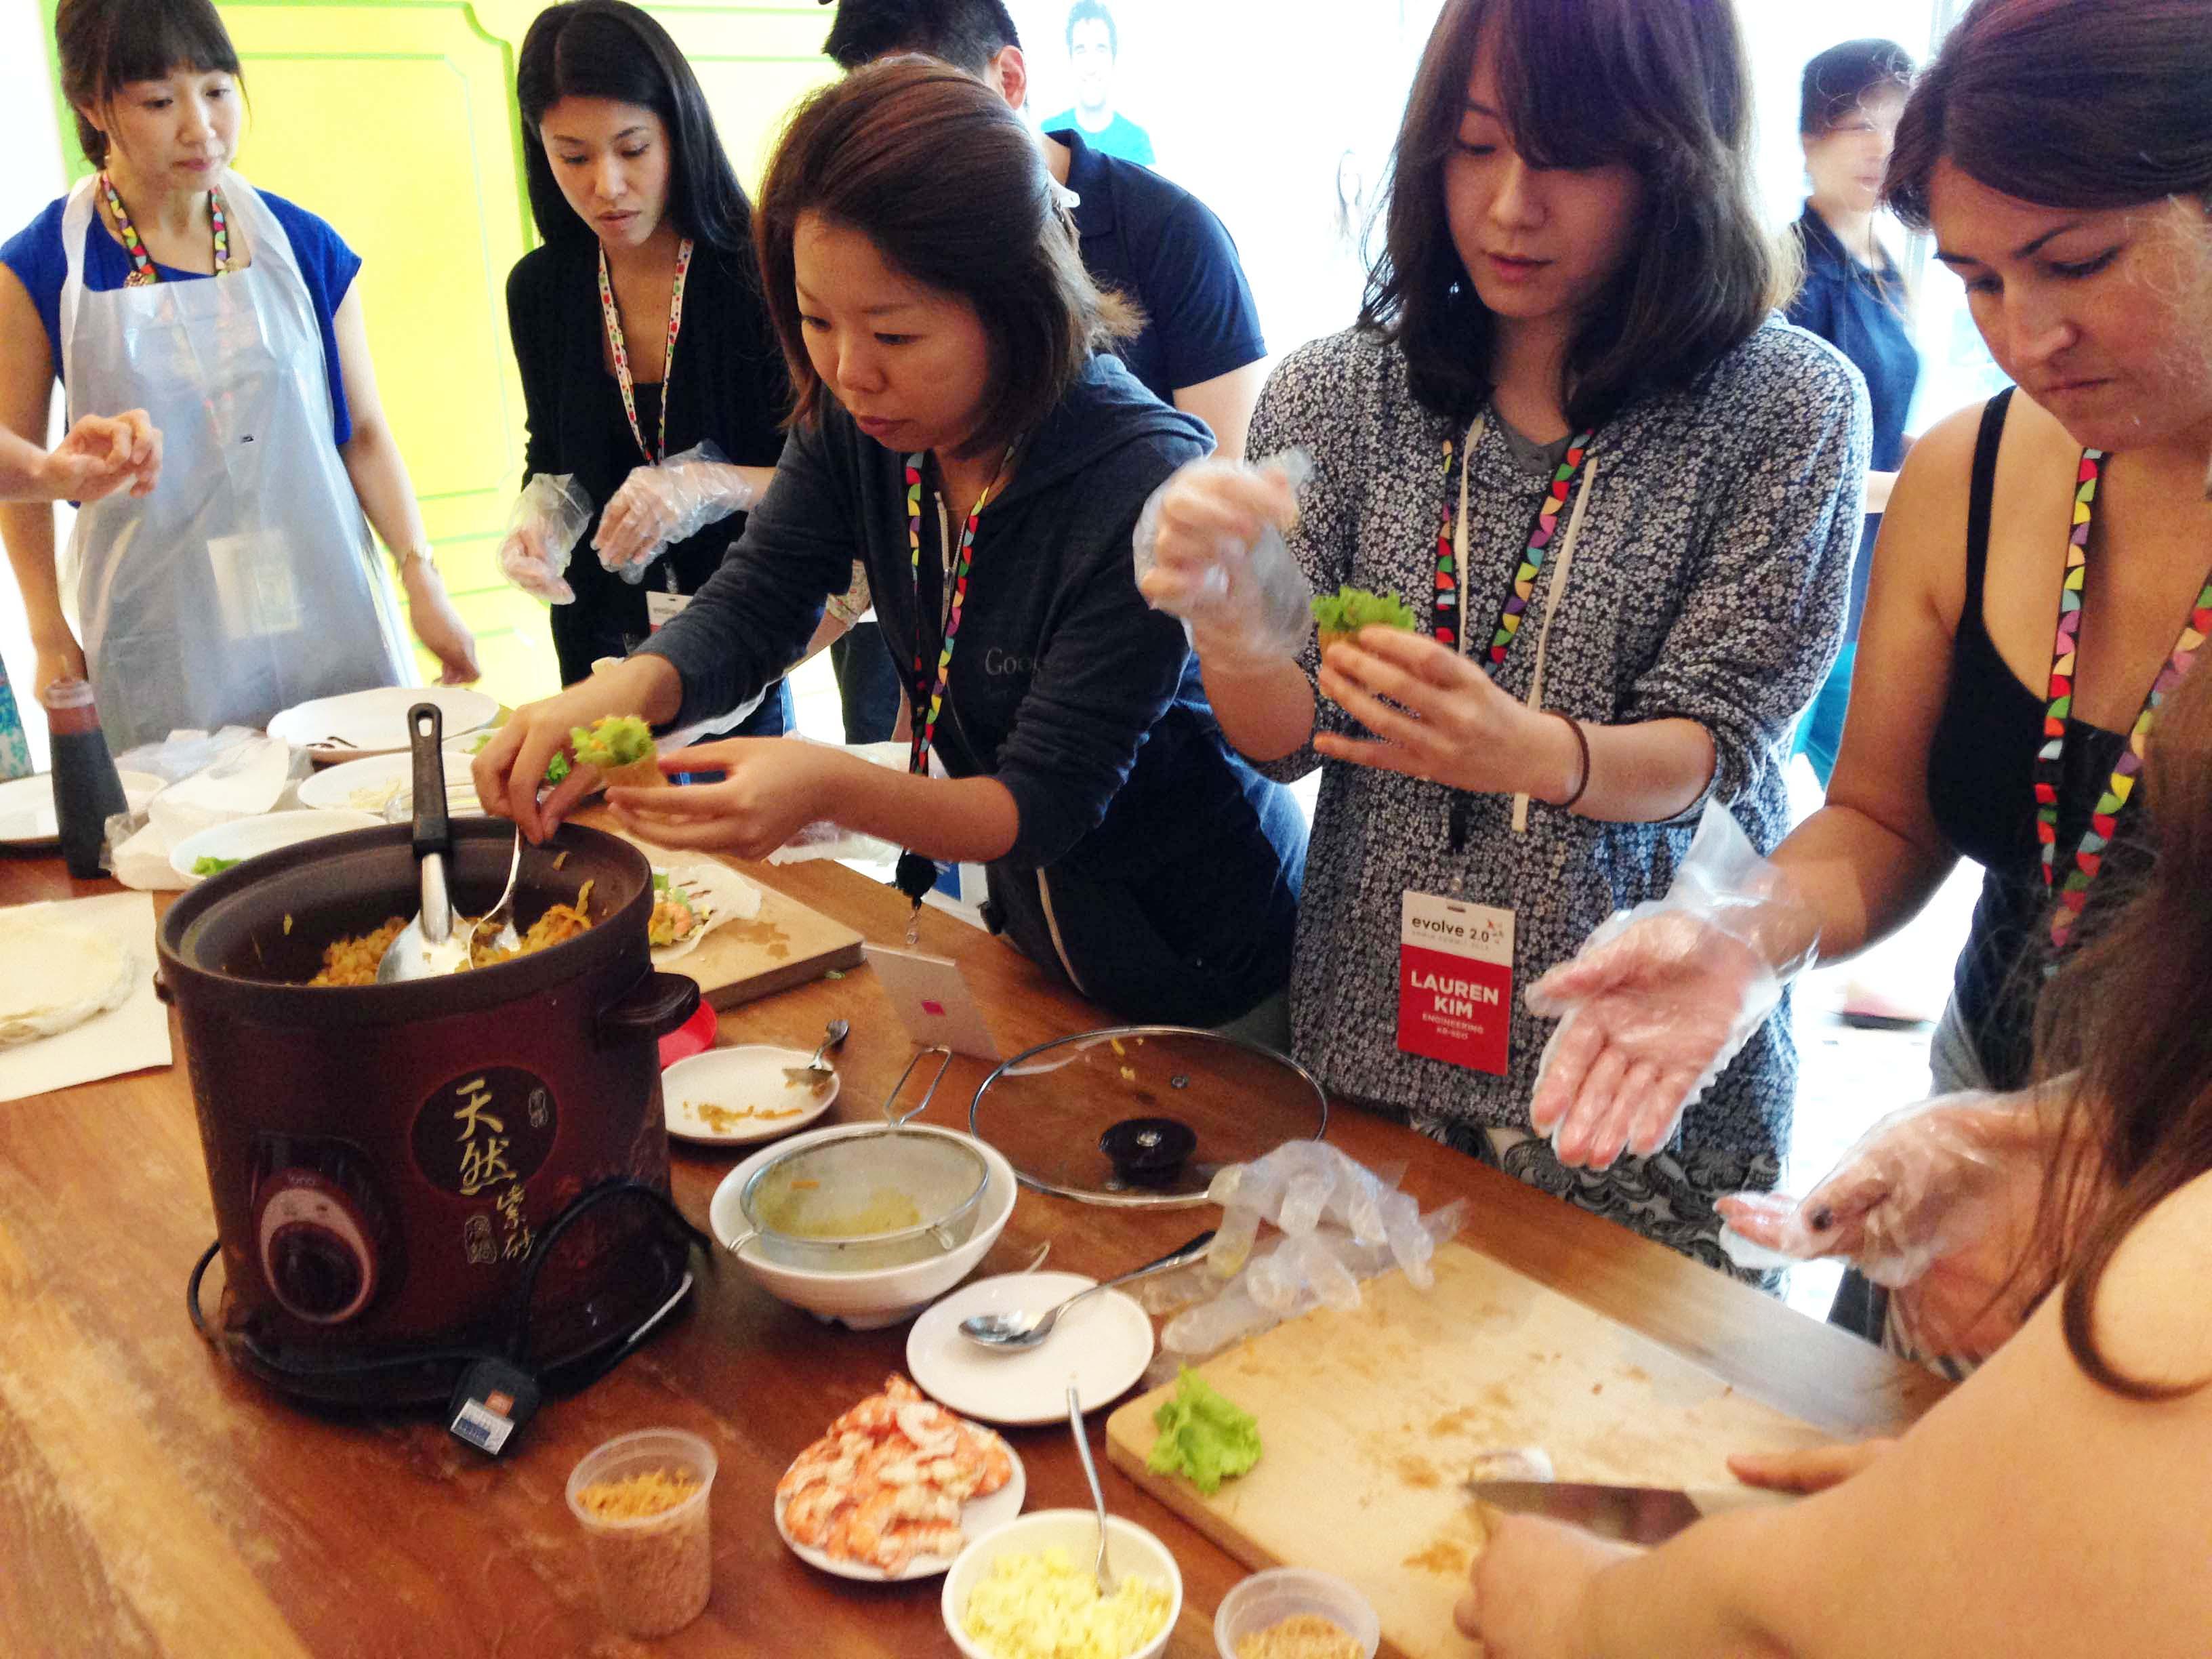 Making kueh pie tees with gusto